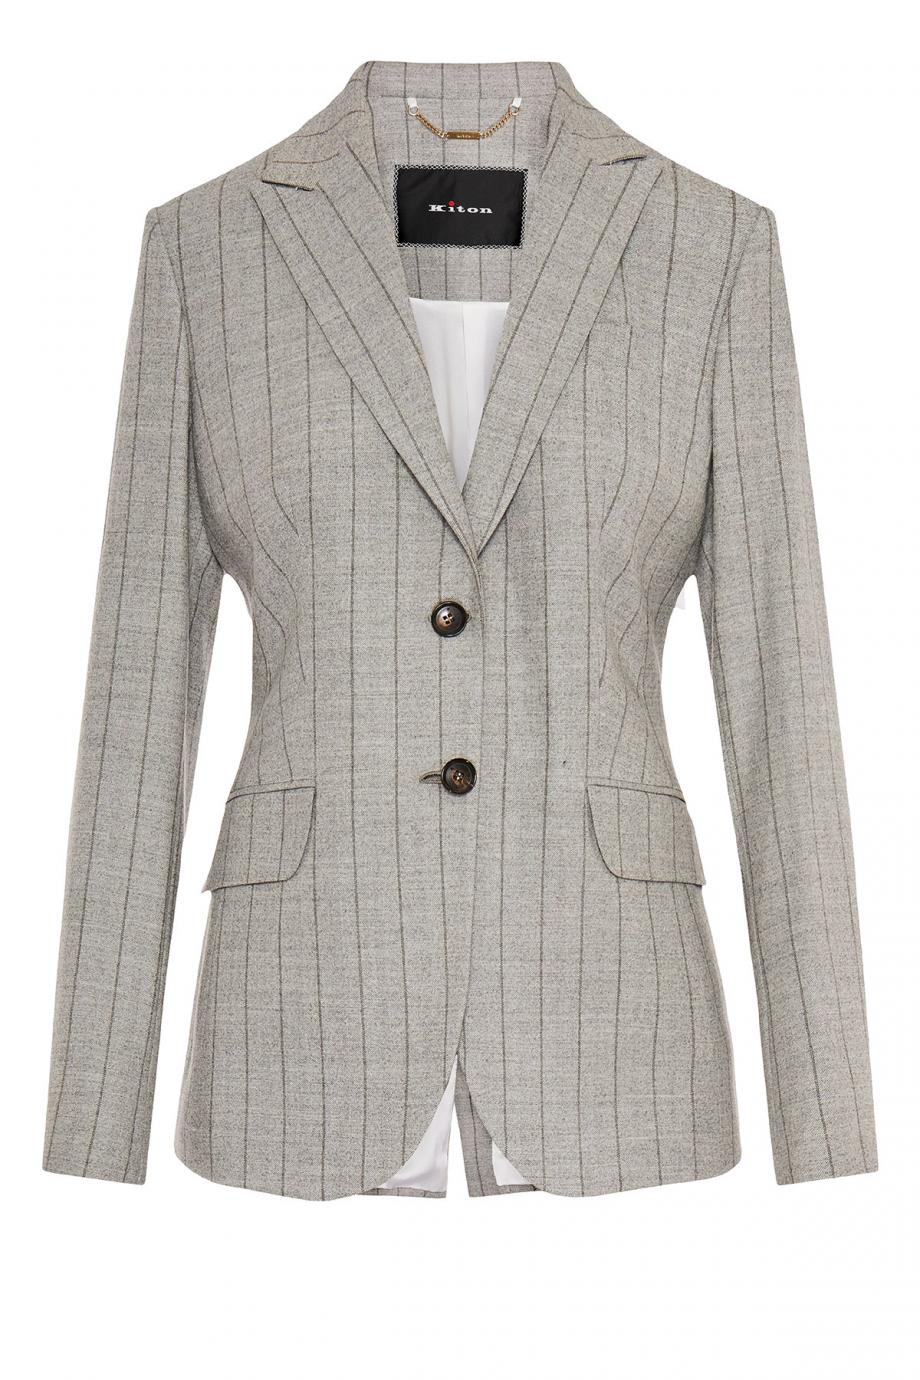 Striped wool-gabardine blazer